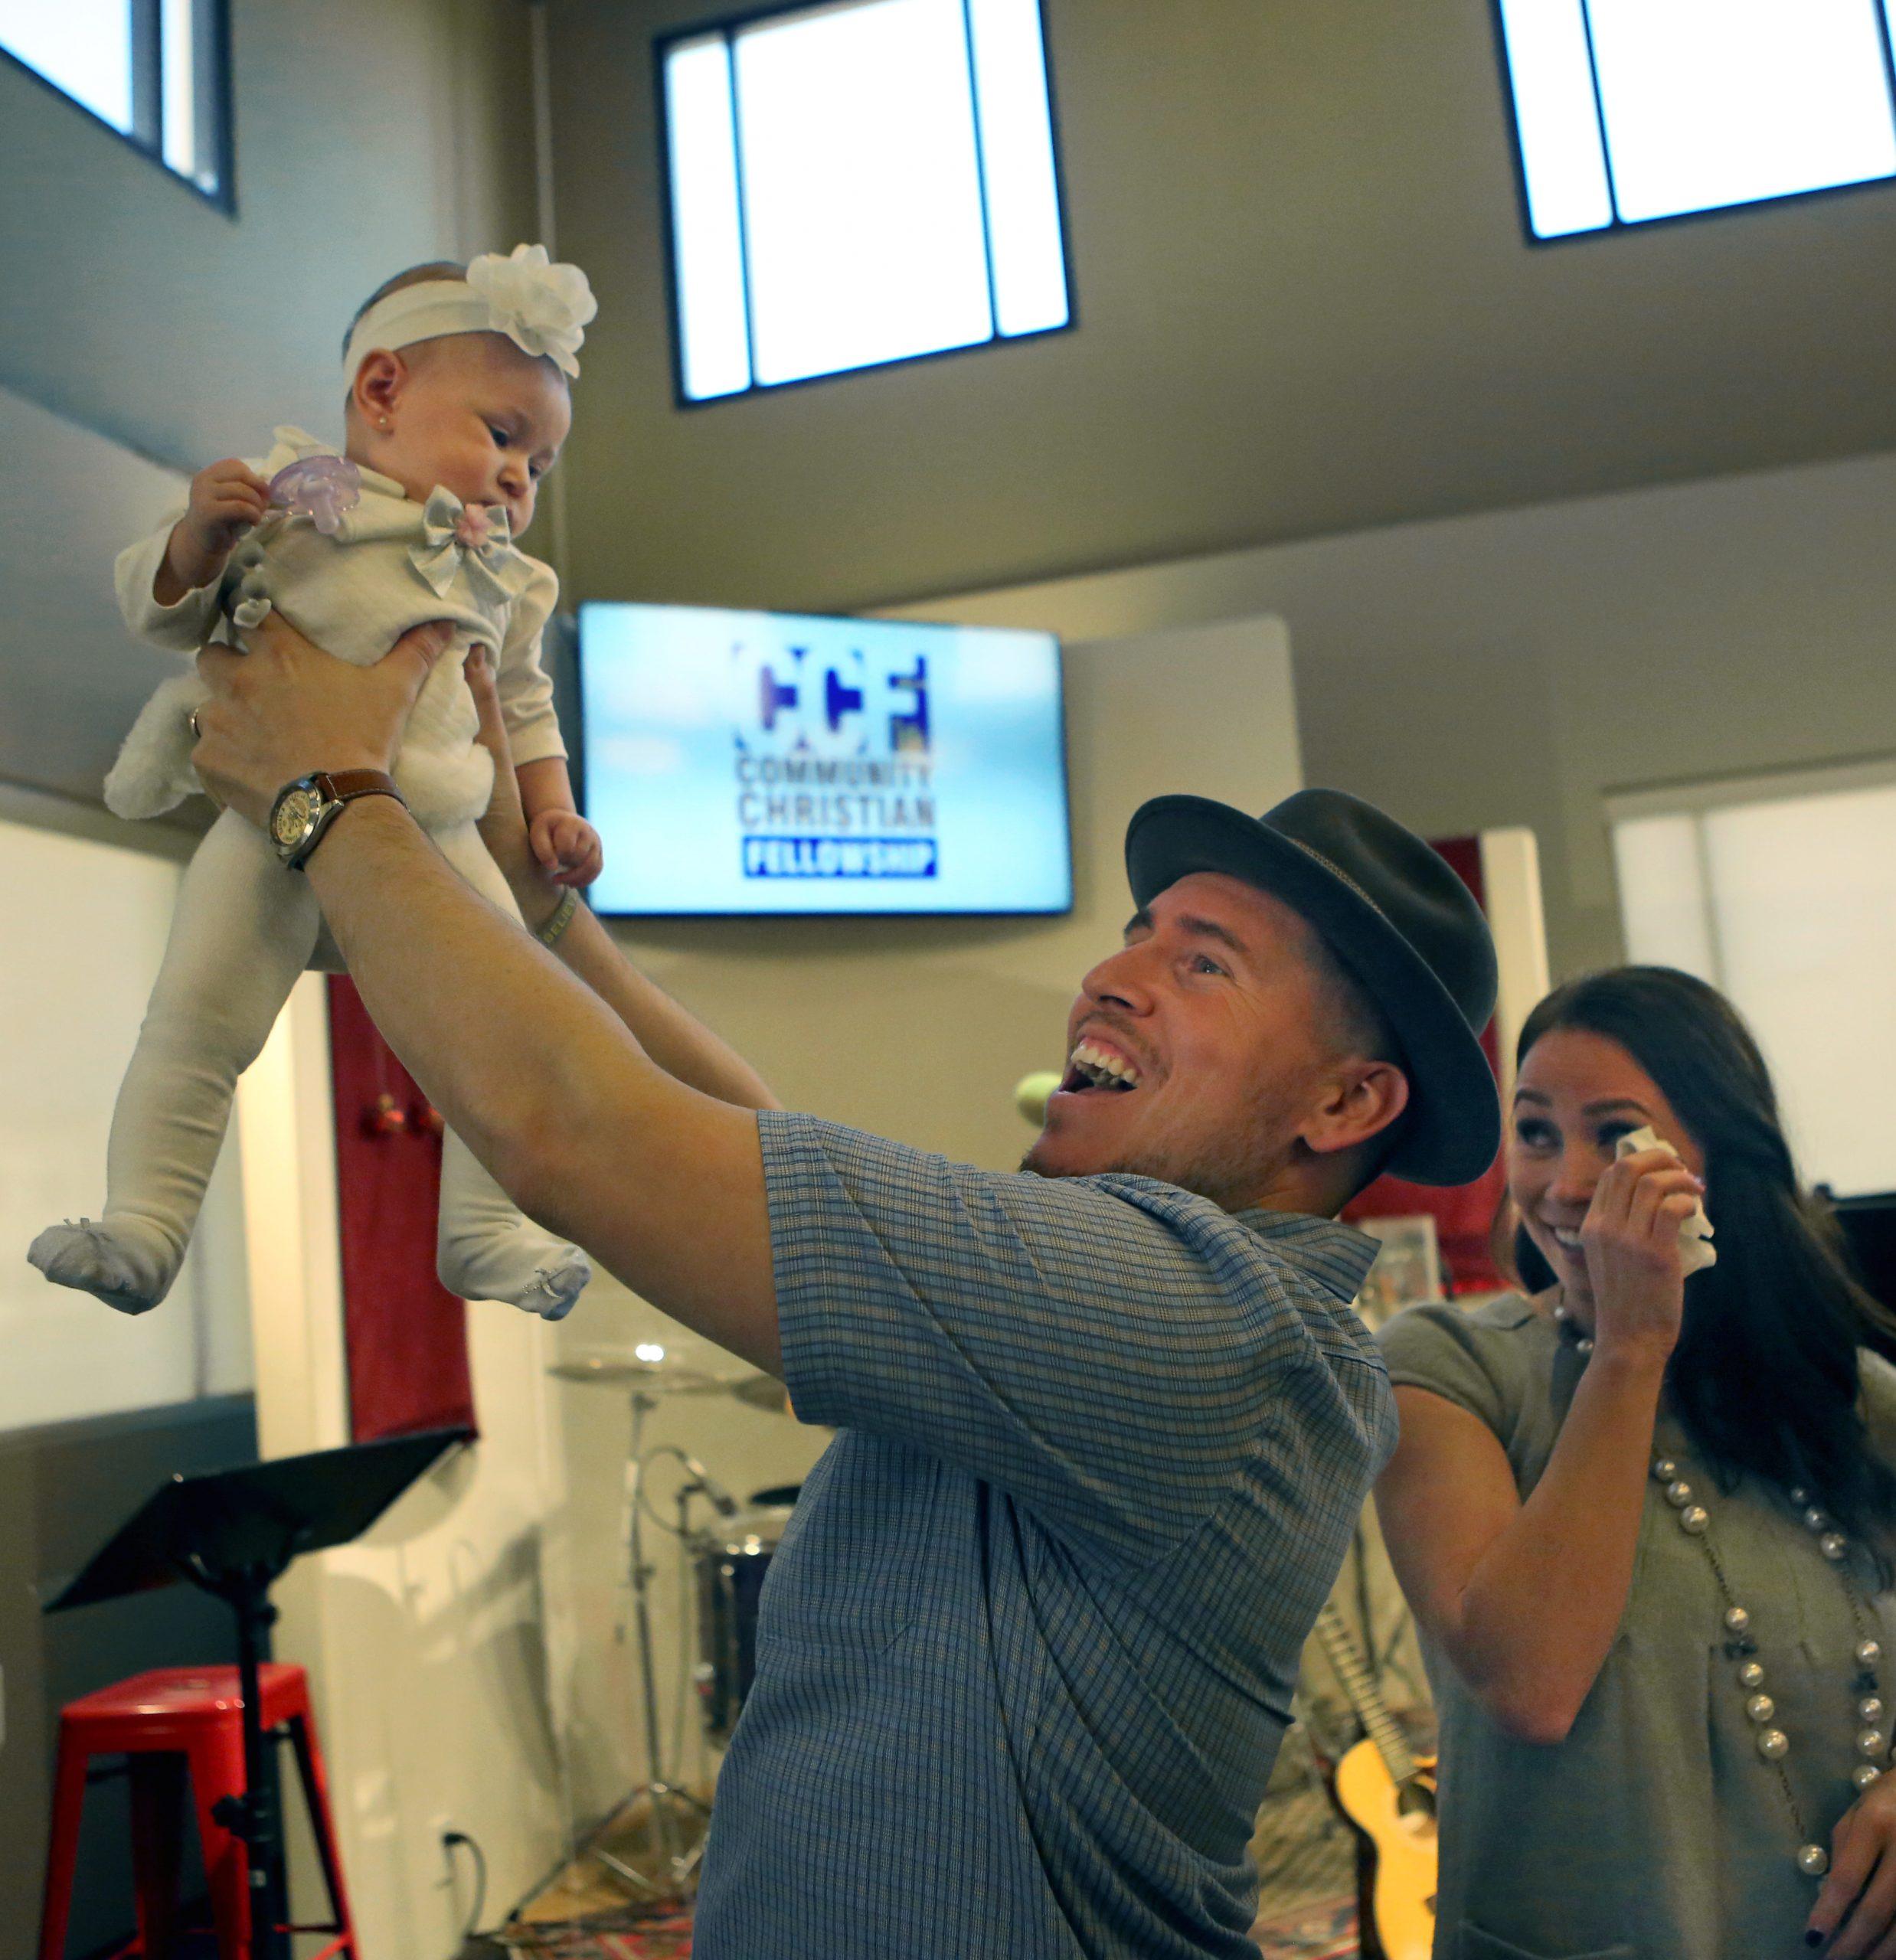 Baby Dedication, Ophelia B. Enriquez 12.17.17 Photos by KAREN TAPIA & GREG ANDERSEN